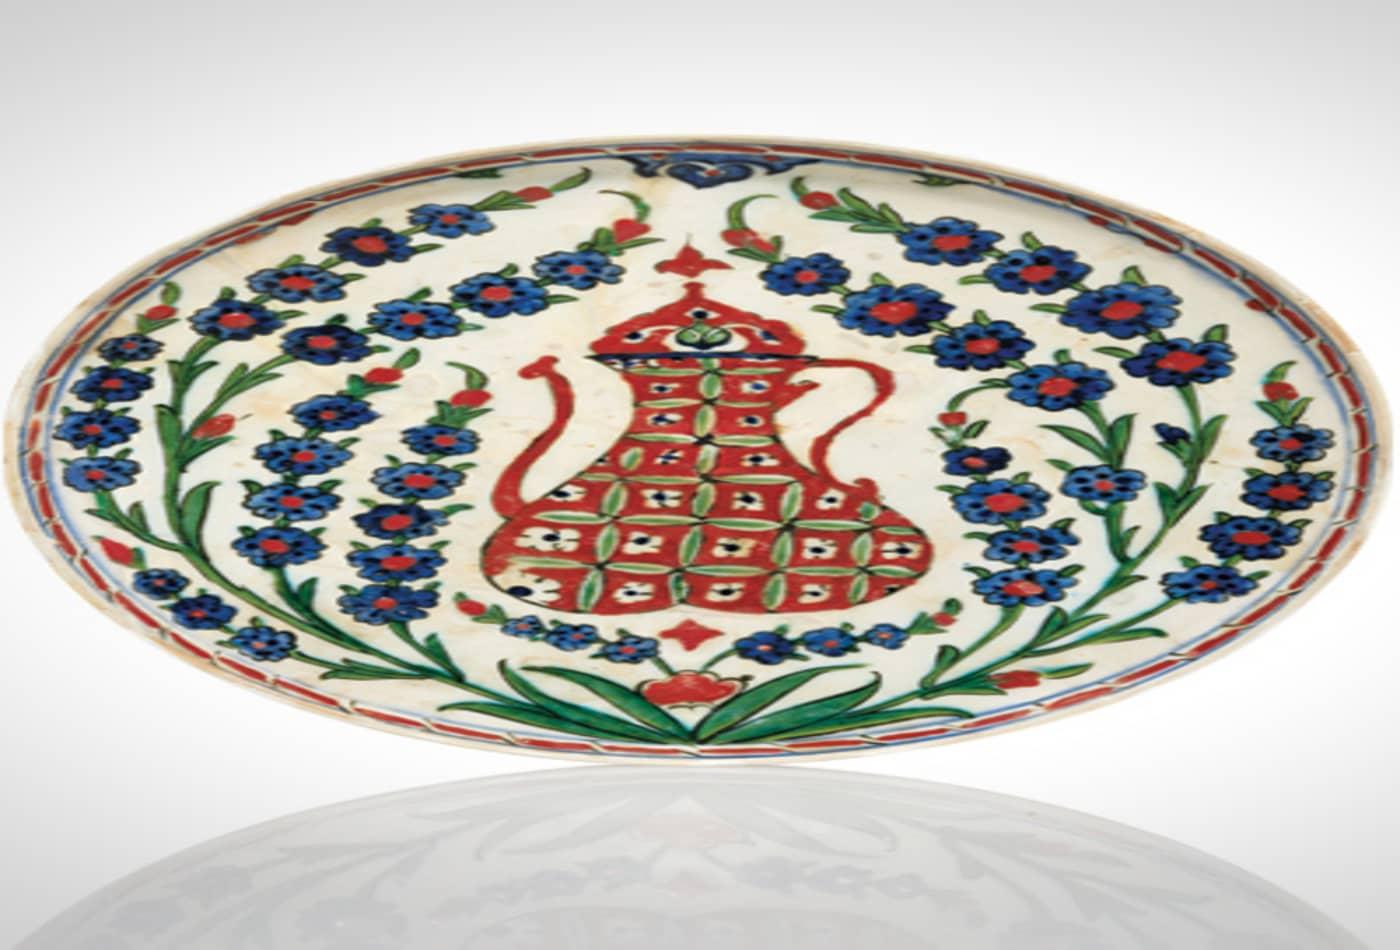 48743550 Investing-in-turkish-treaures-Iznik-dish-ewer.jpg